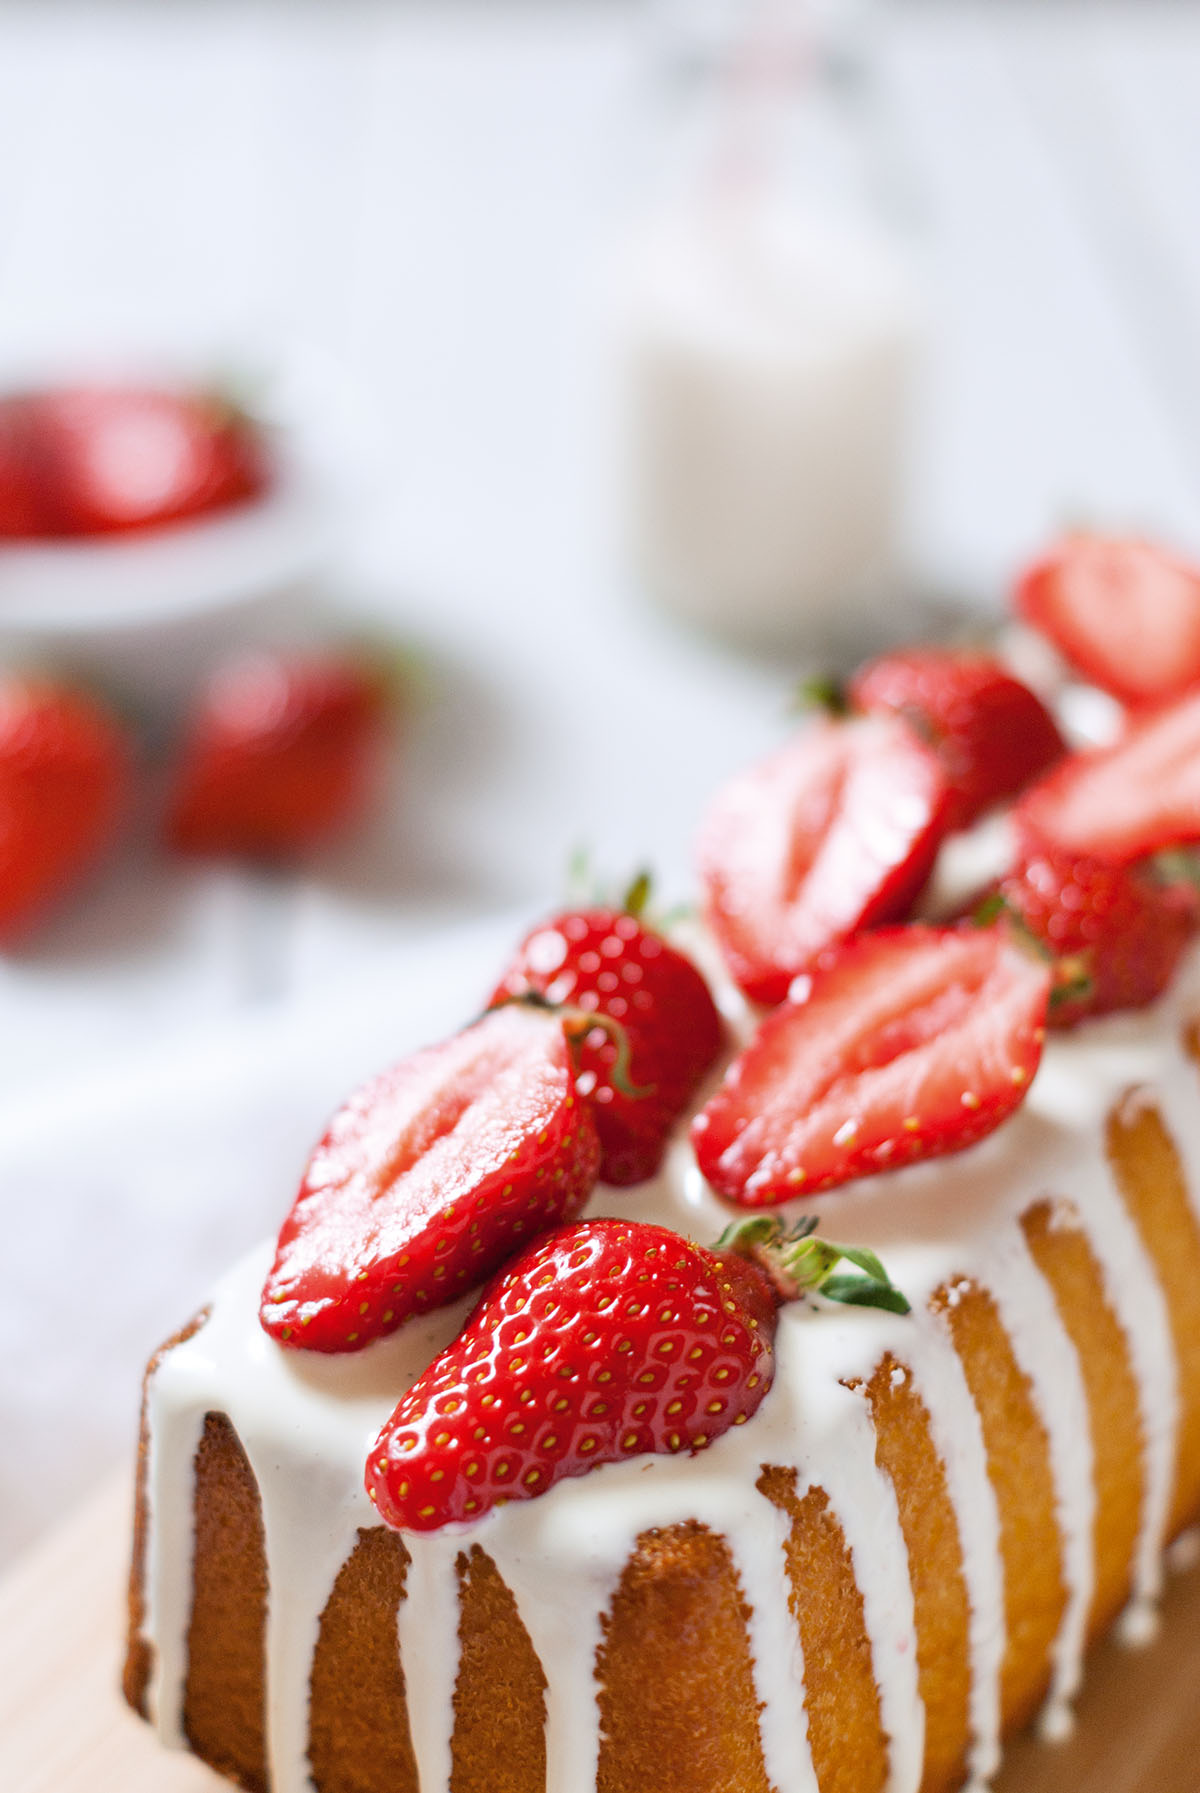 Cake surprise vanille fraise | Lilie Bakery